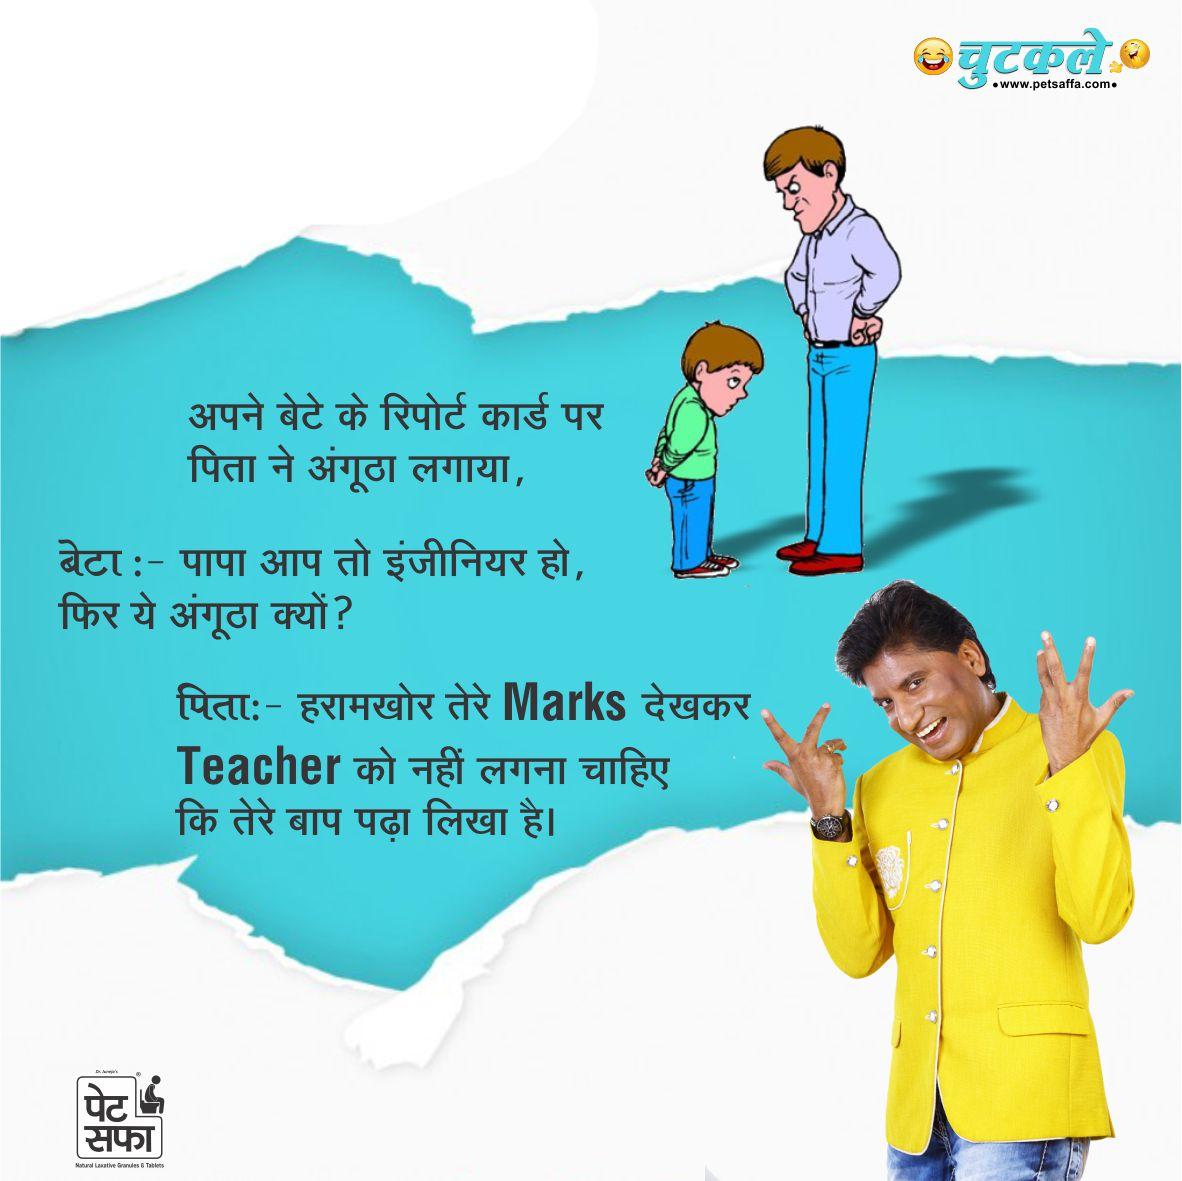 Papa Beta Funny Jokes And Hindi Chutkule